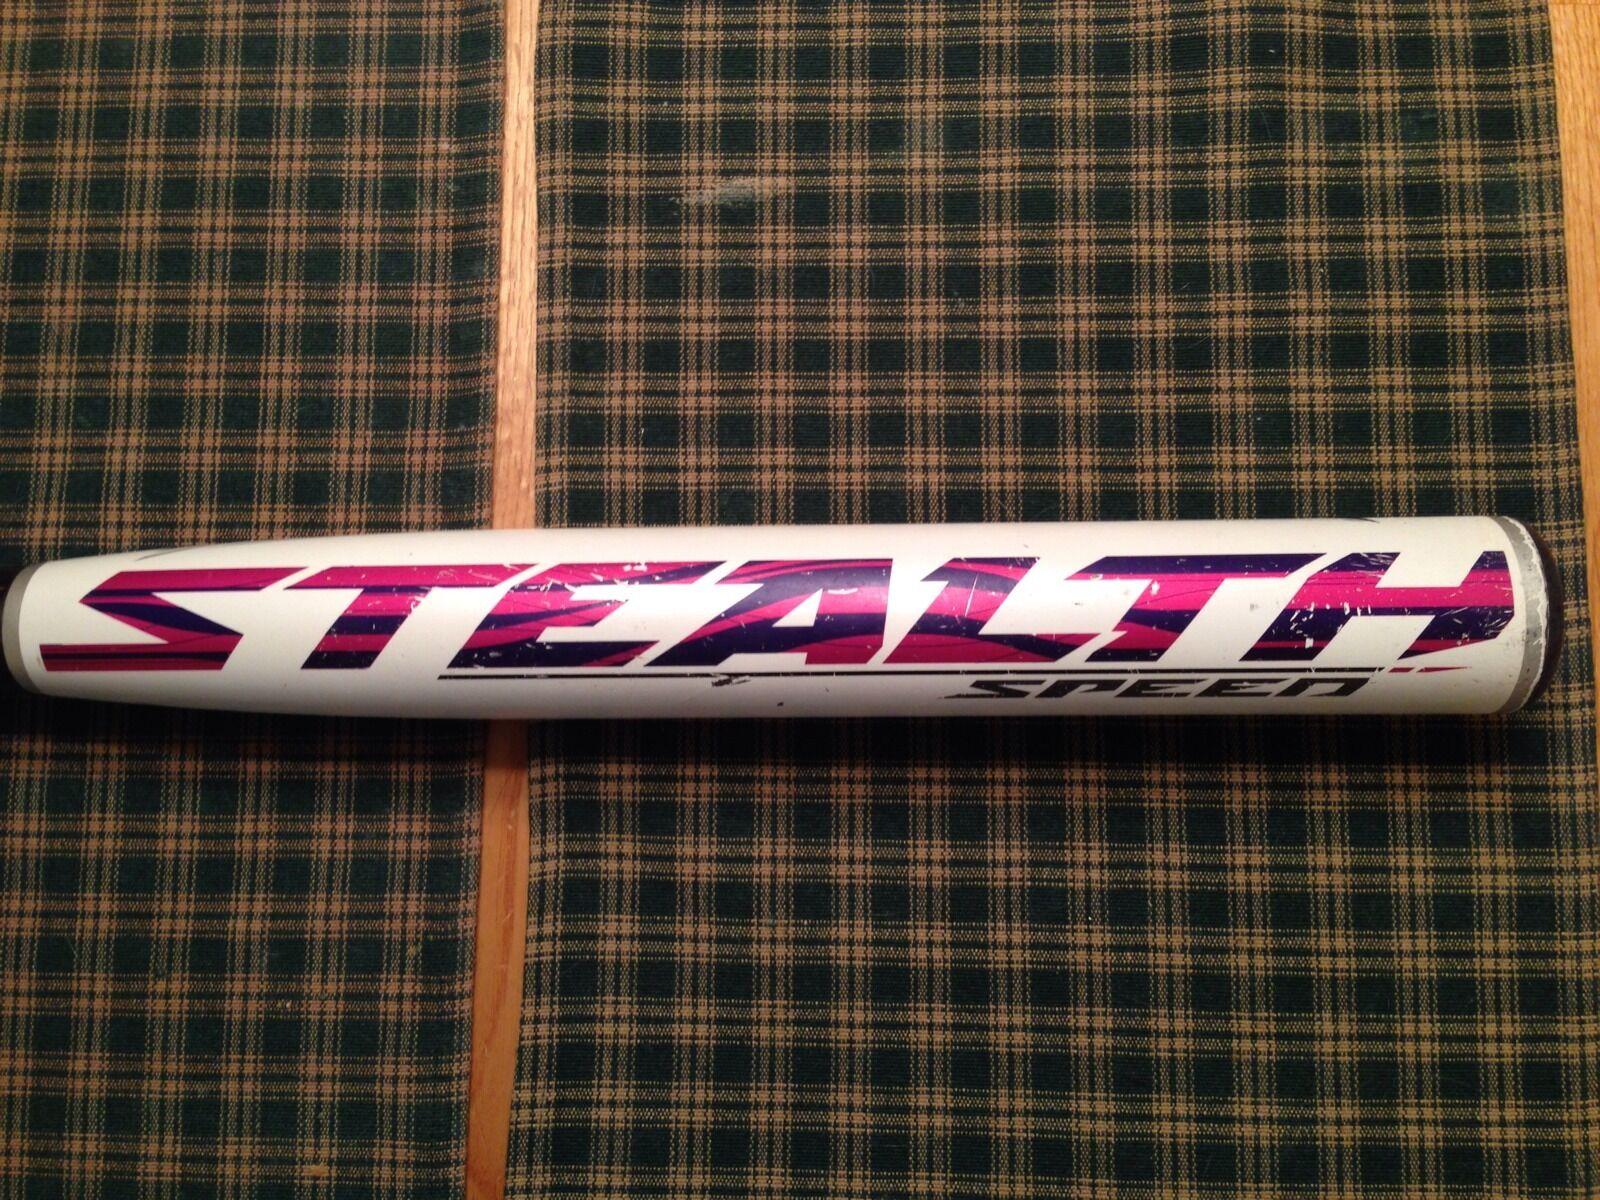 RARE USED Easton Stealth Speed SSR3B Fastpitch Softball Bat 33 23 ASA HOT